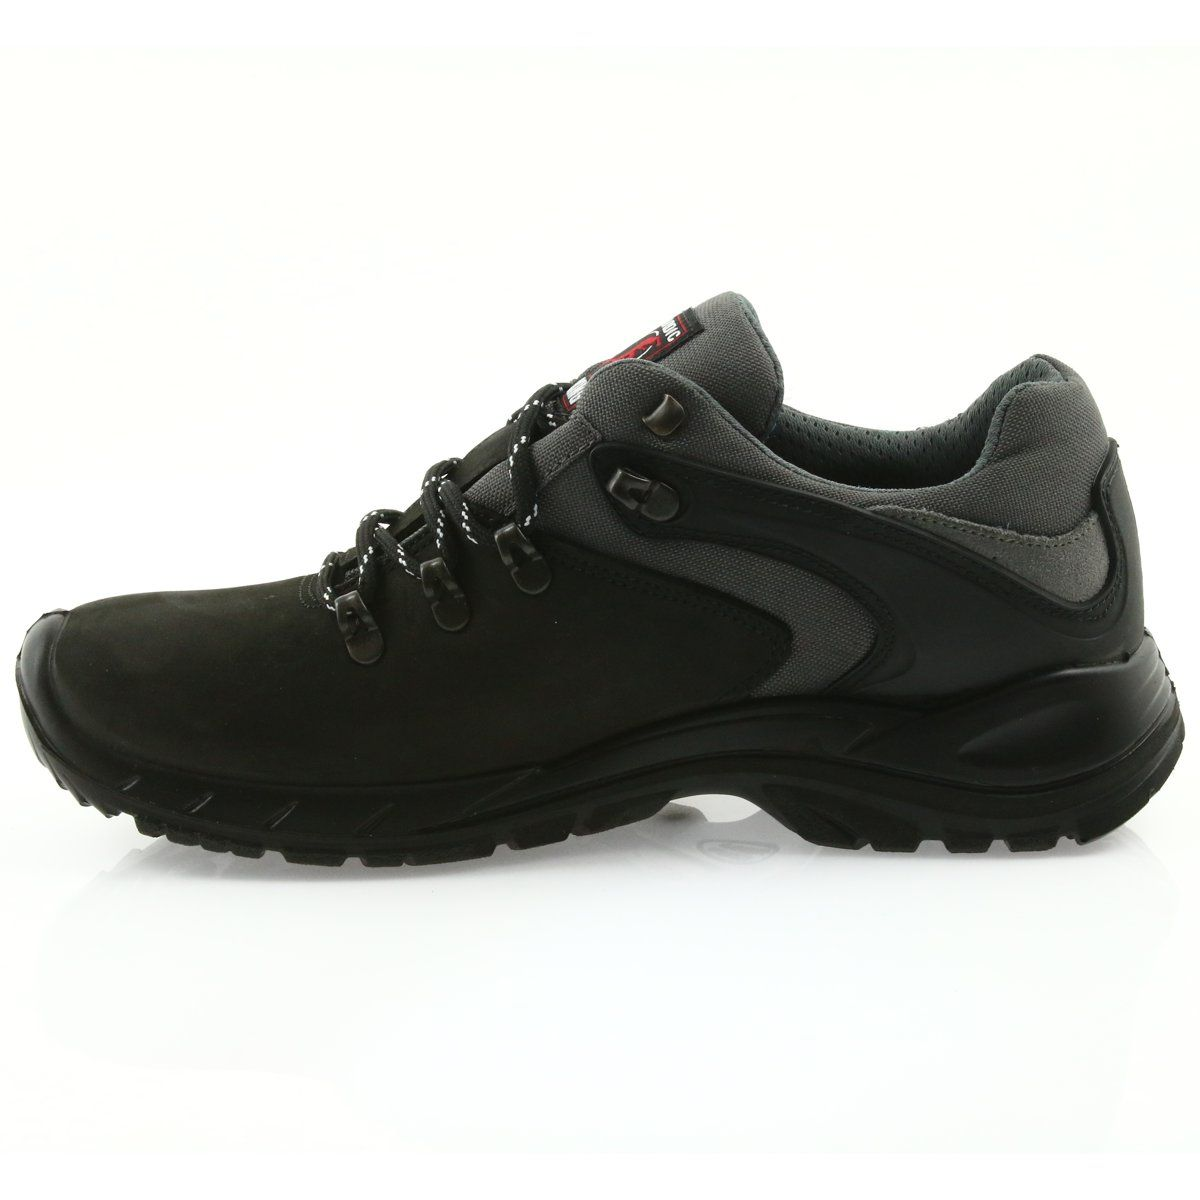 Sprandi Grisport Nordic Walking Czarne Z Membrana Nordic Walking All Black Sneakers Hiking Boots